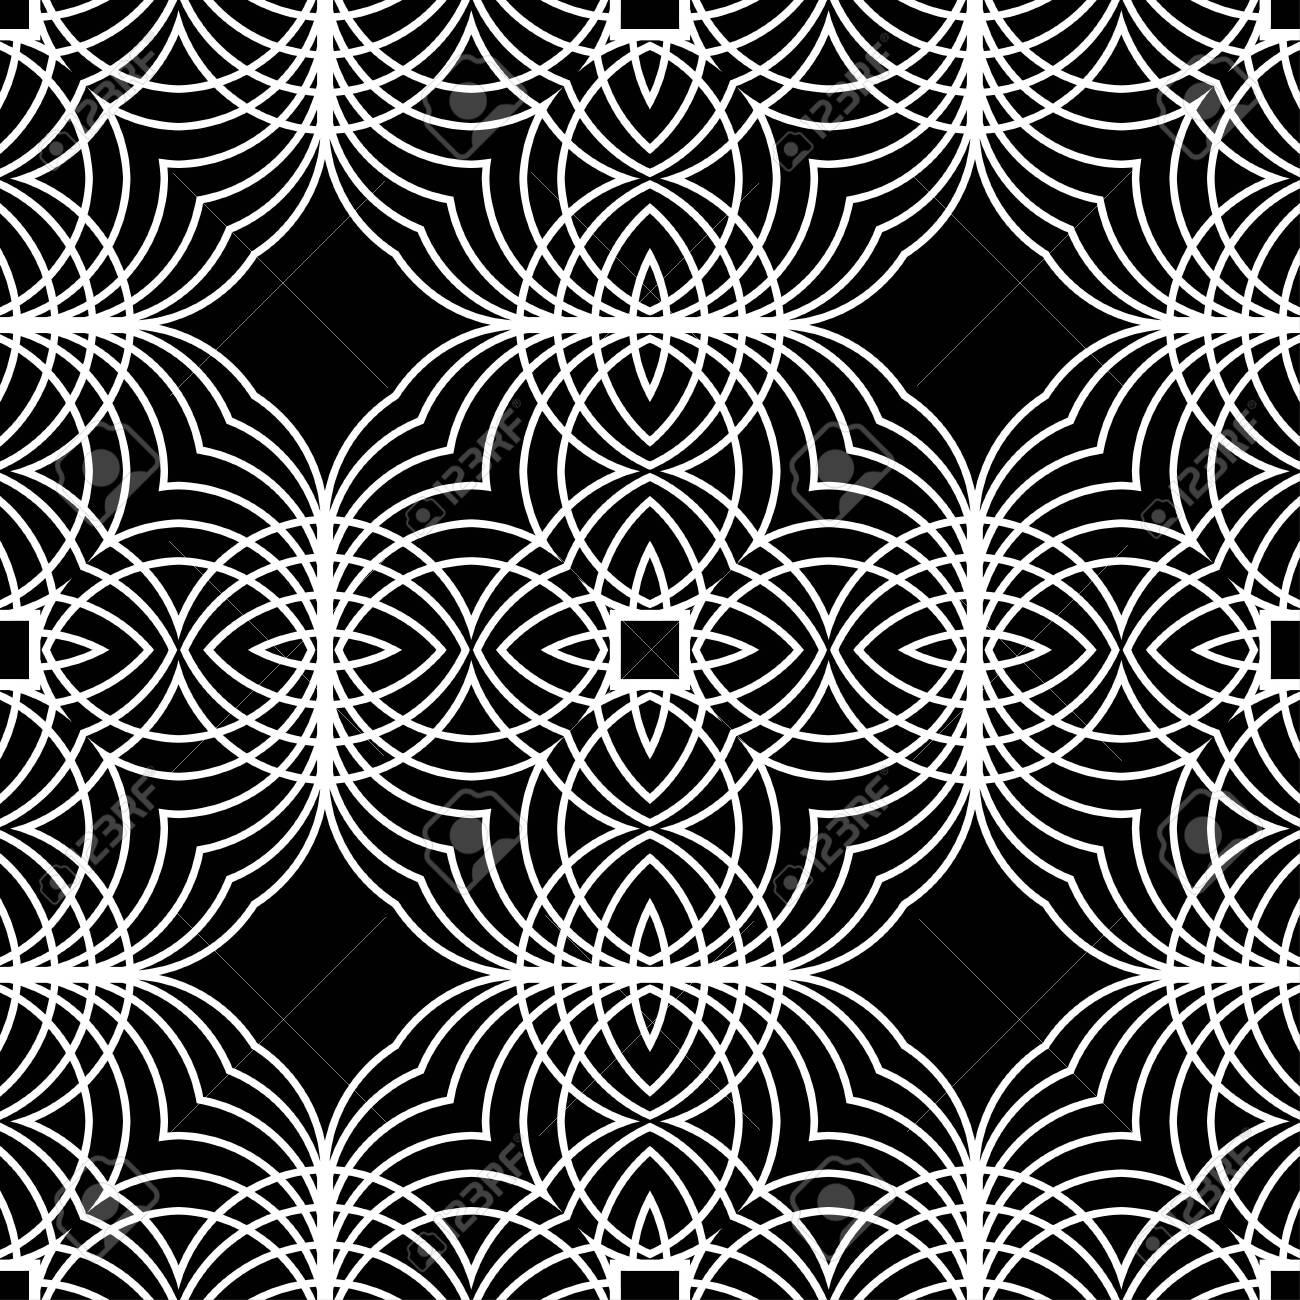 Marvelous Art Deco Pattern Seamless Background Geometric Design 1920 30S Download Free Architecture Designs Grimeyleaguecom